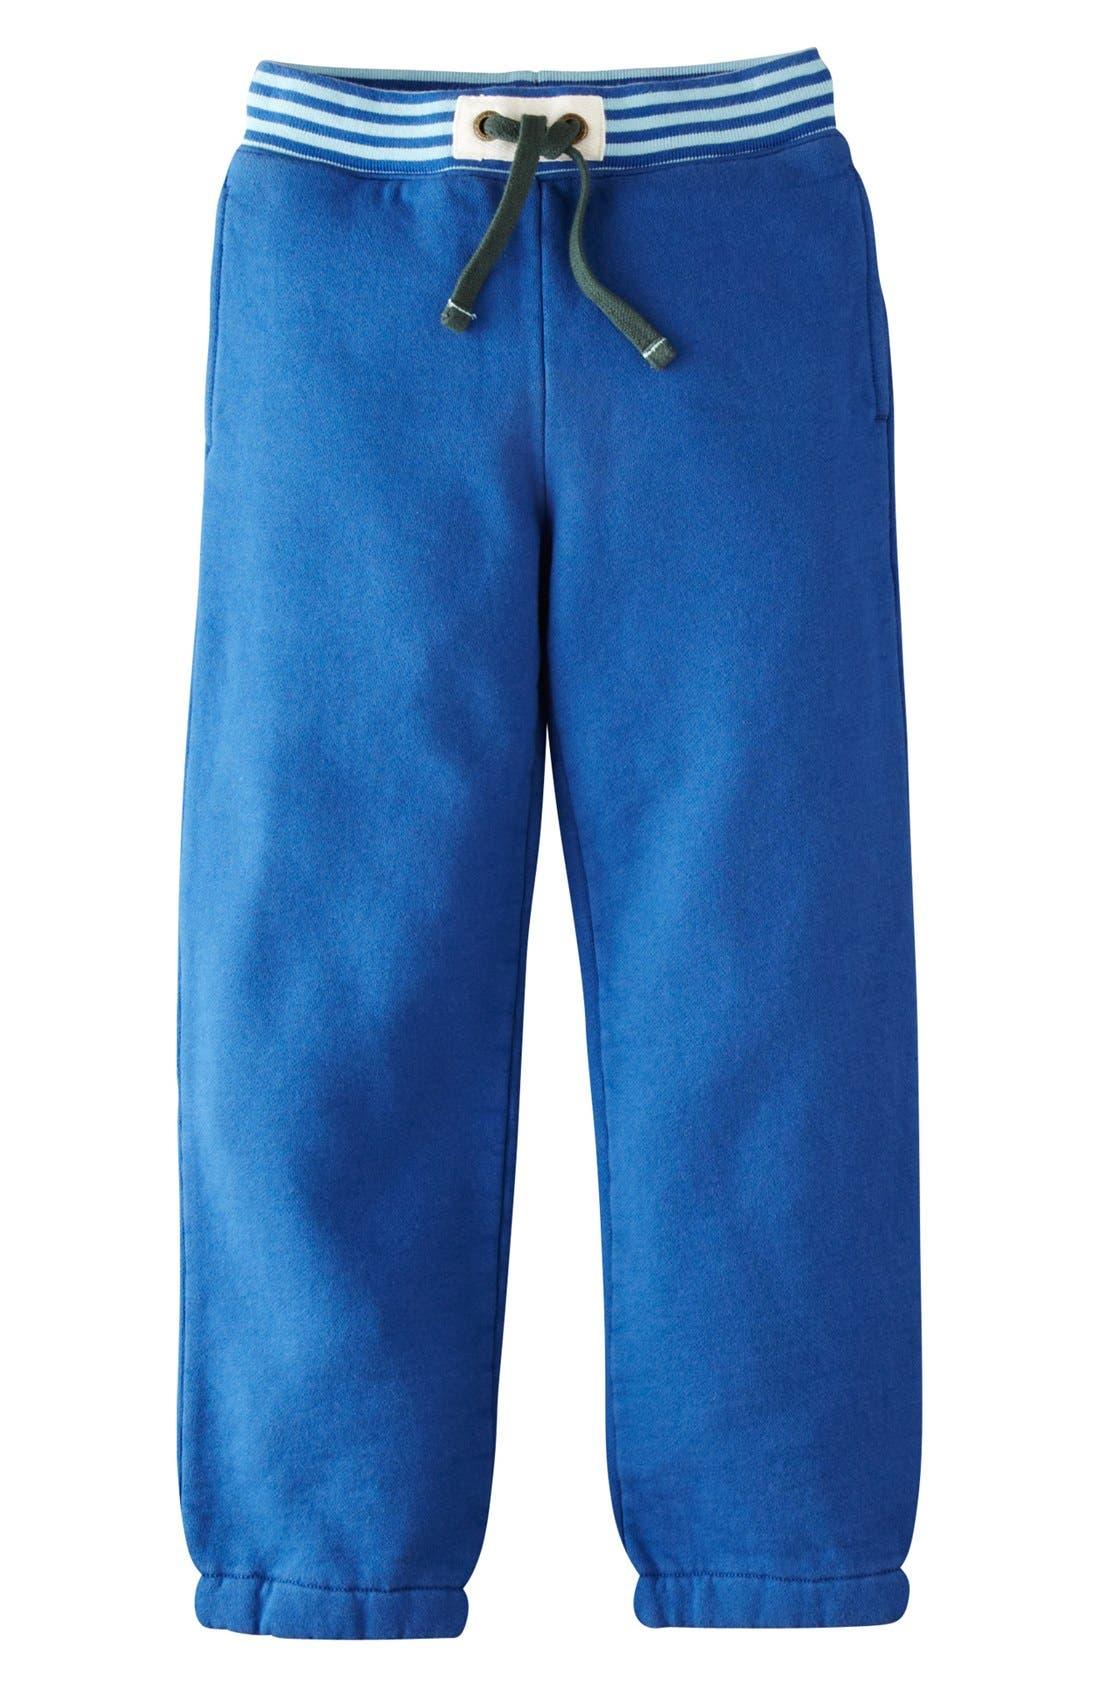 Main Image - Mini Boden Track Pants (Toddler Boys, Little Boys & Big Boys)